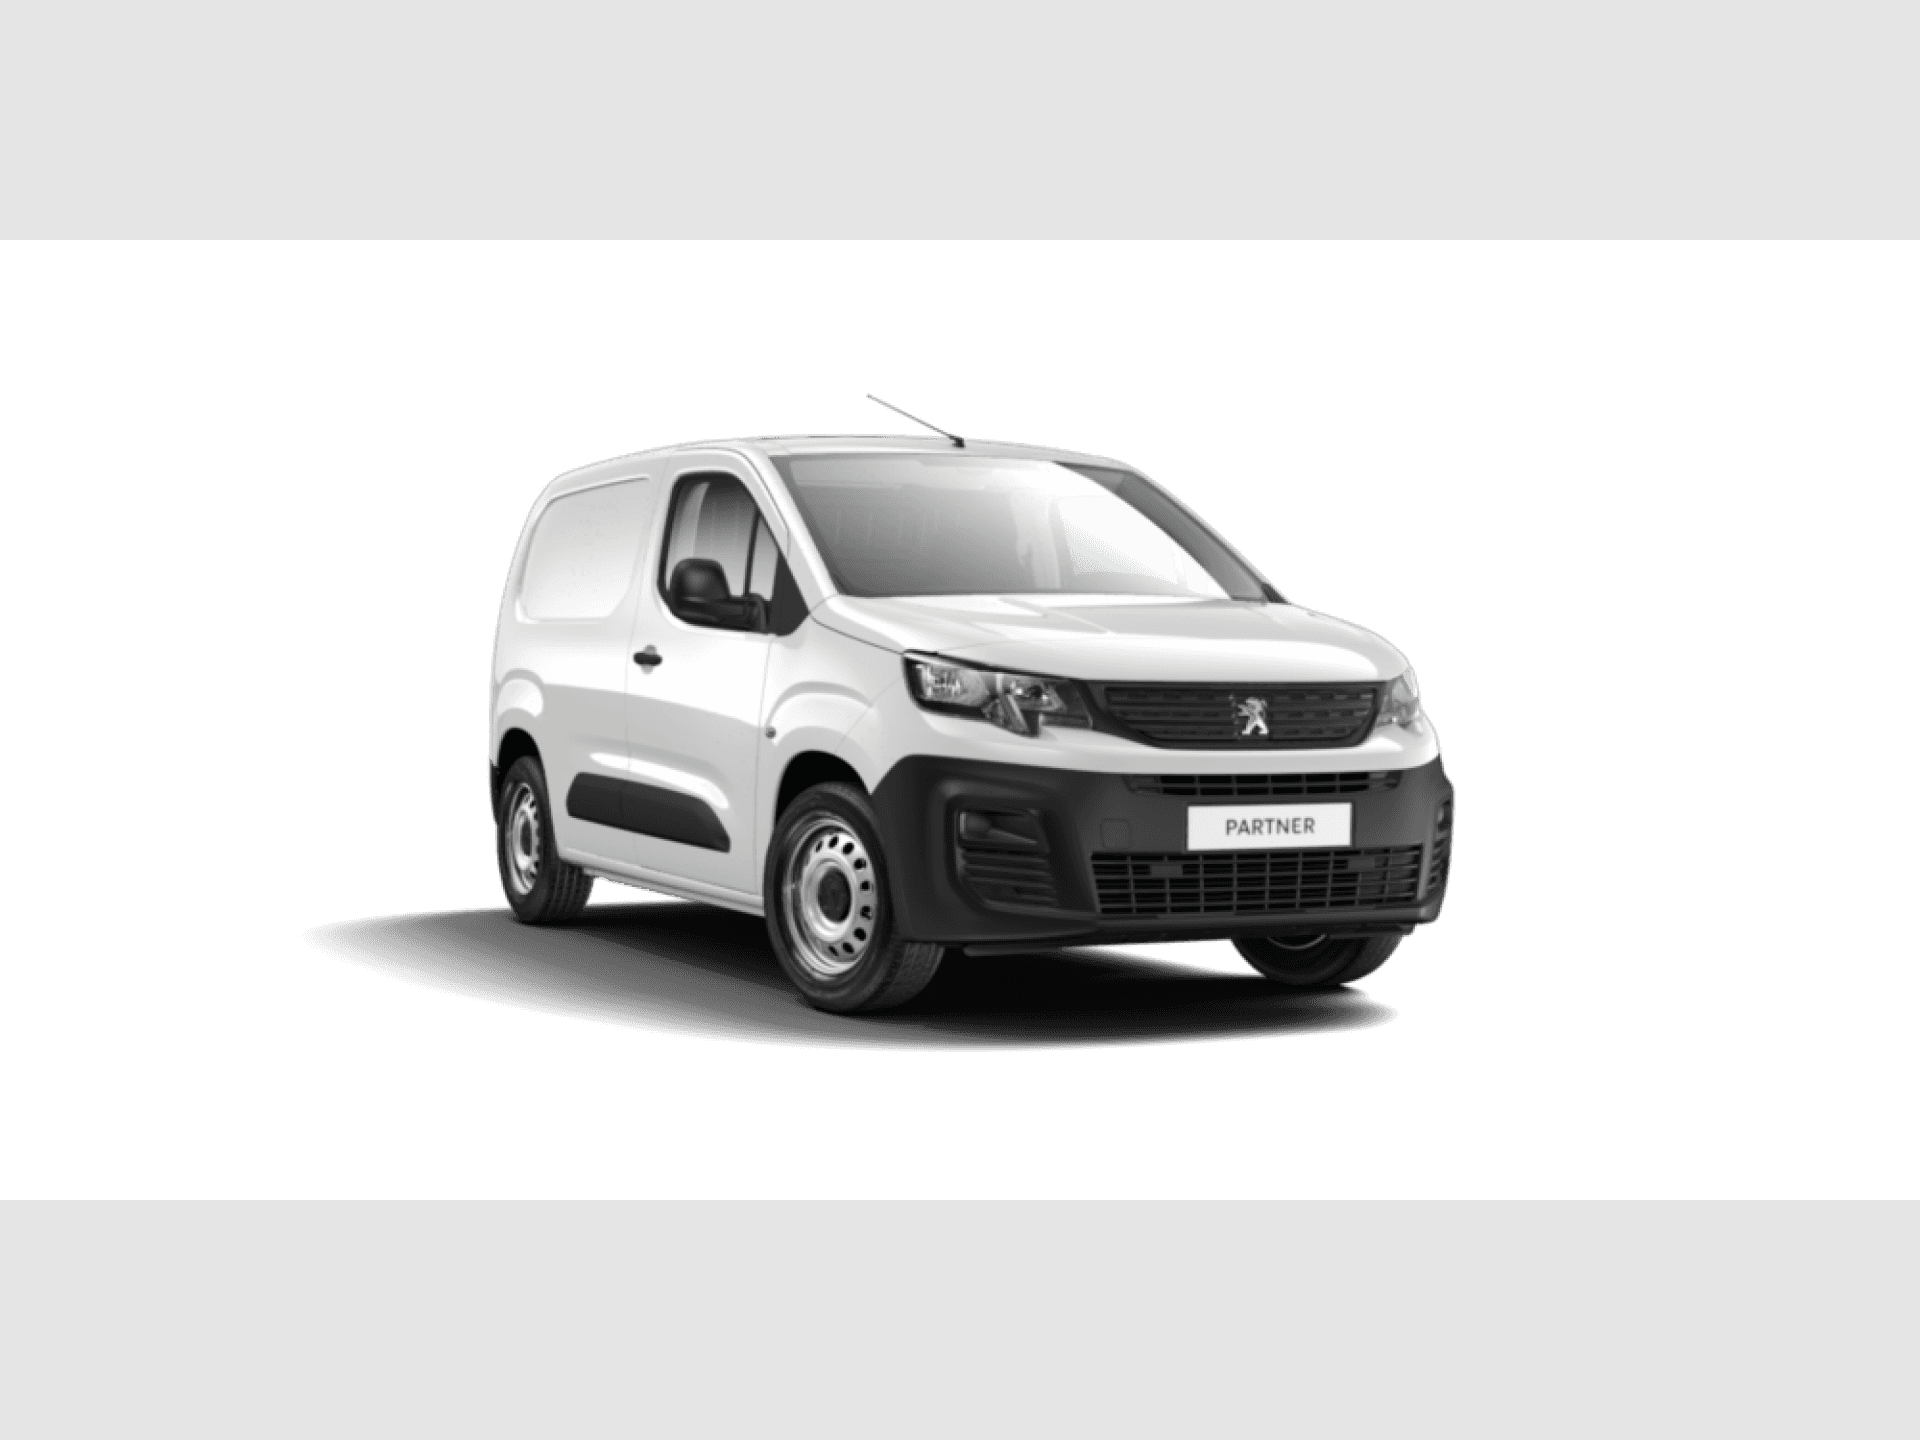 Peugeot Partner Pro Standard 600kg BlueHDi 73kW segunda mano Cádiz